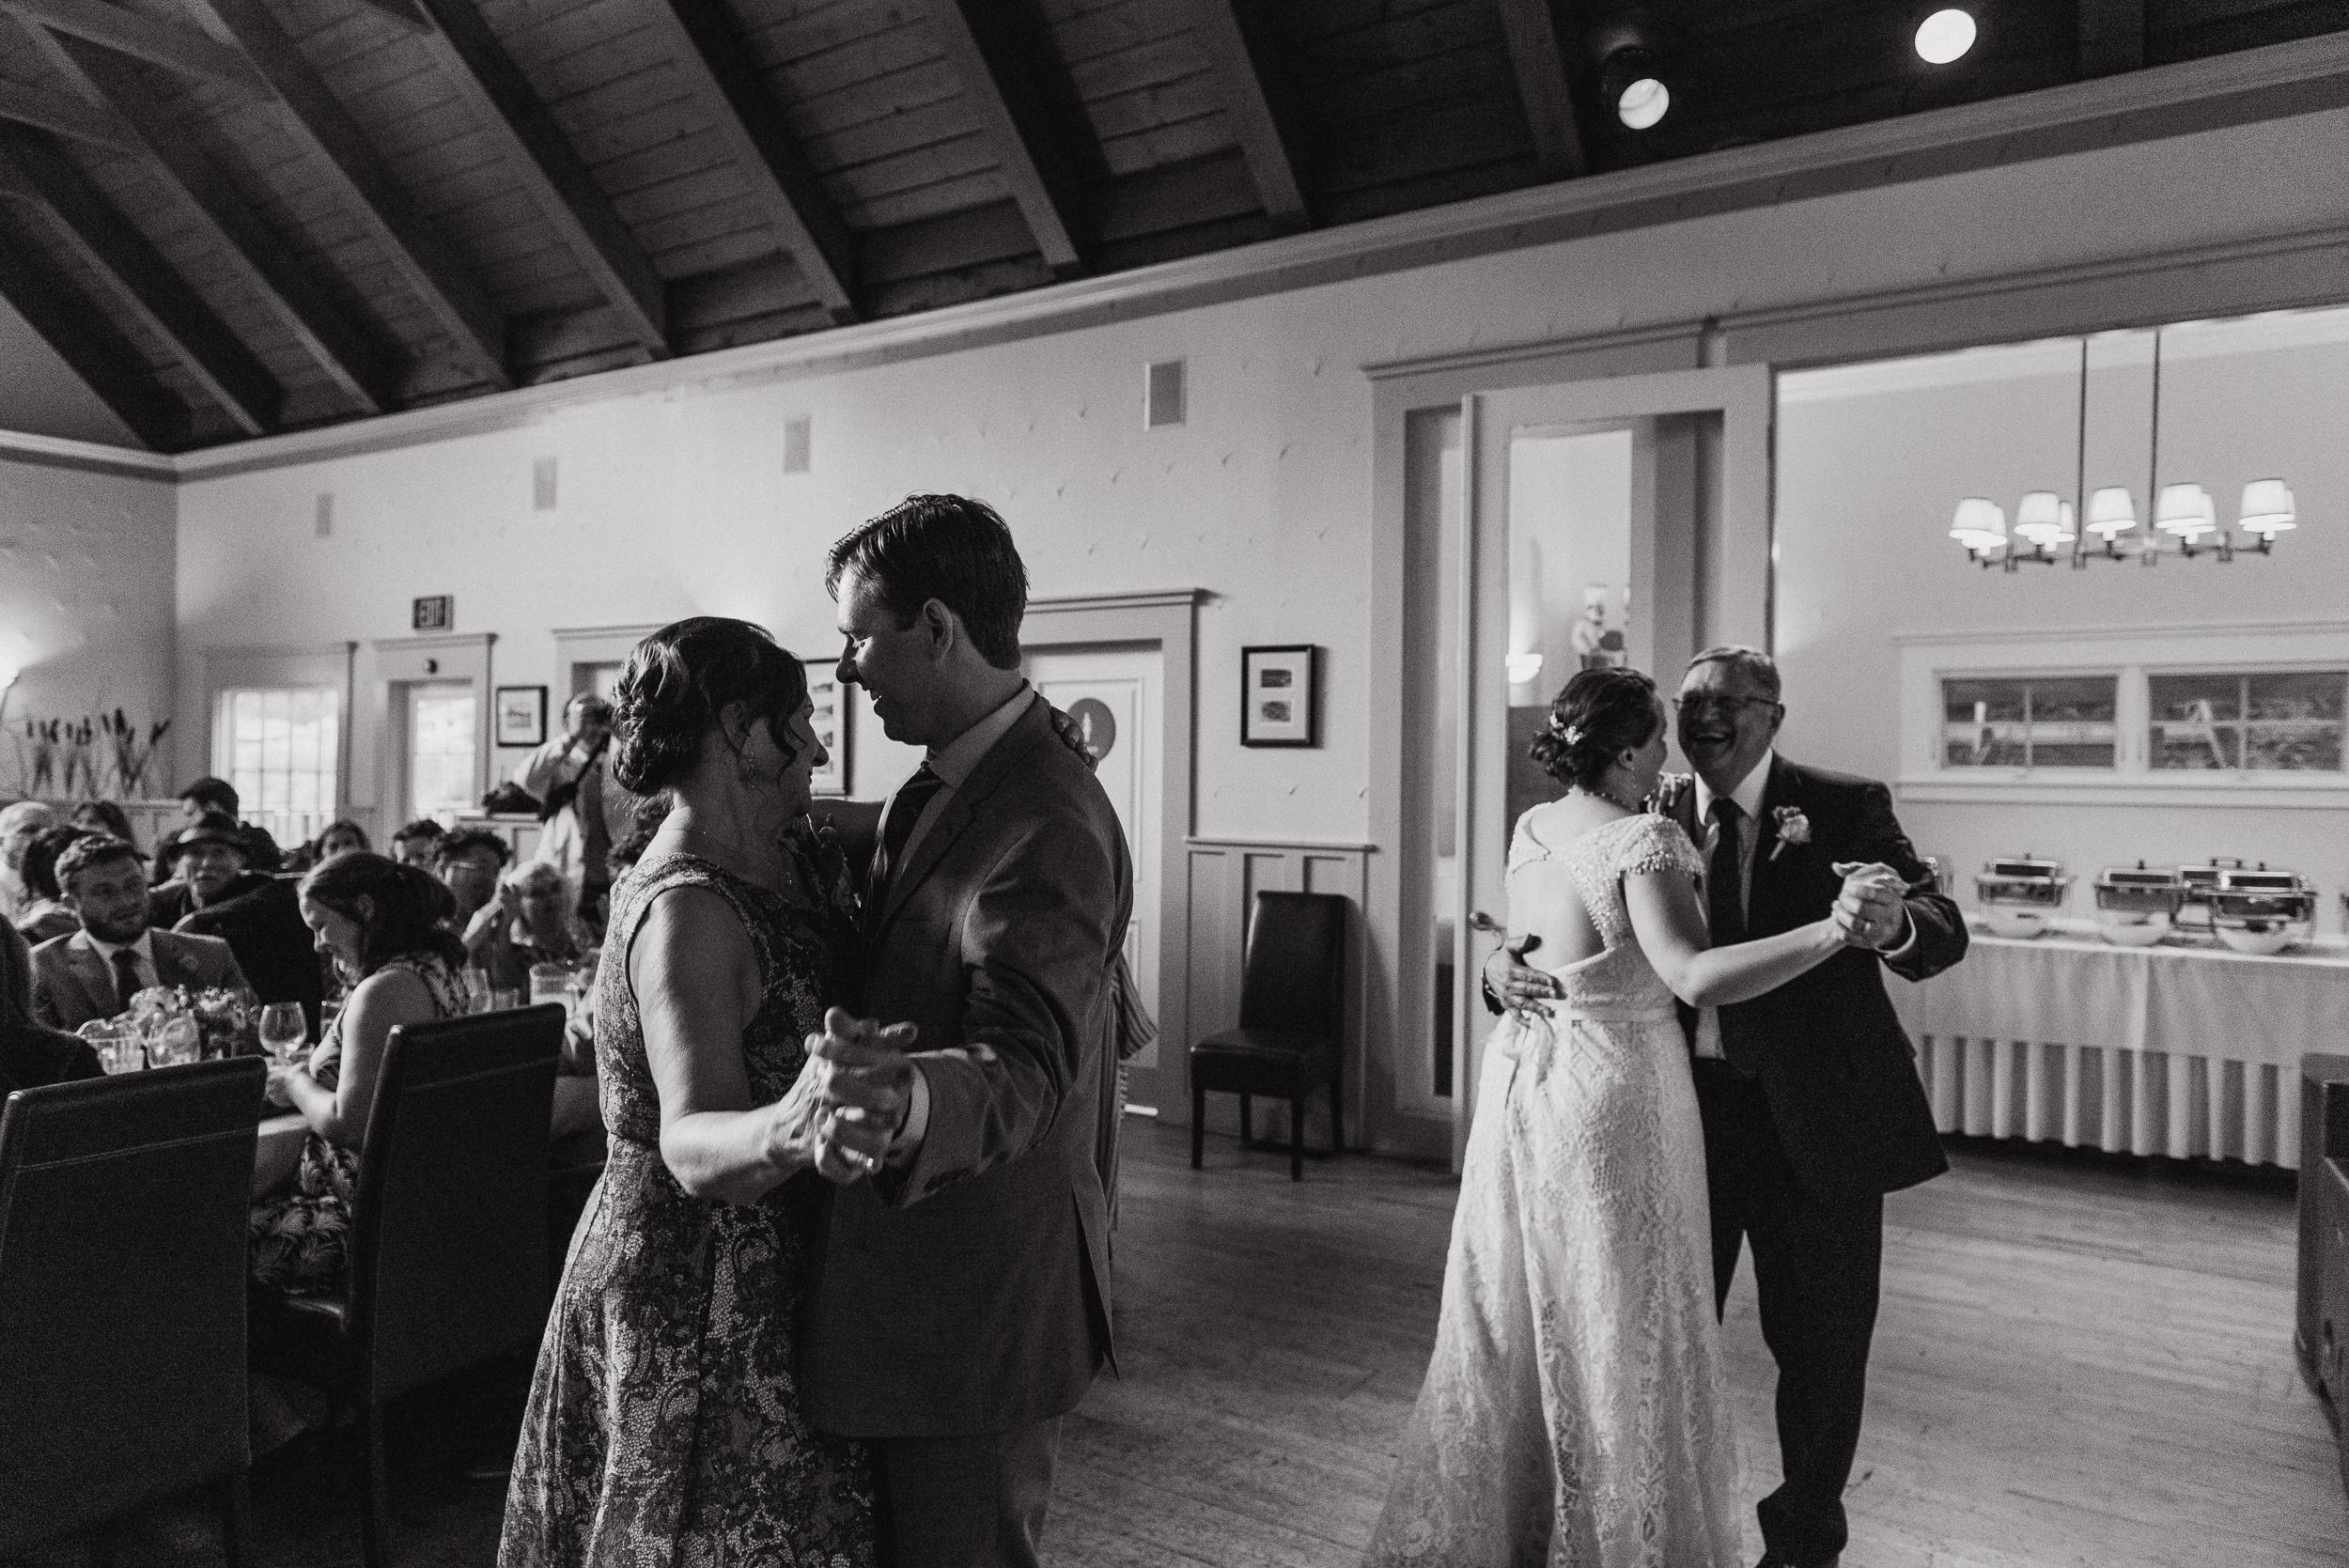 099-highland-dell-lodge-russian-river-wedding-vivianchen-604.jpg